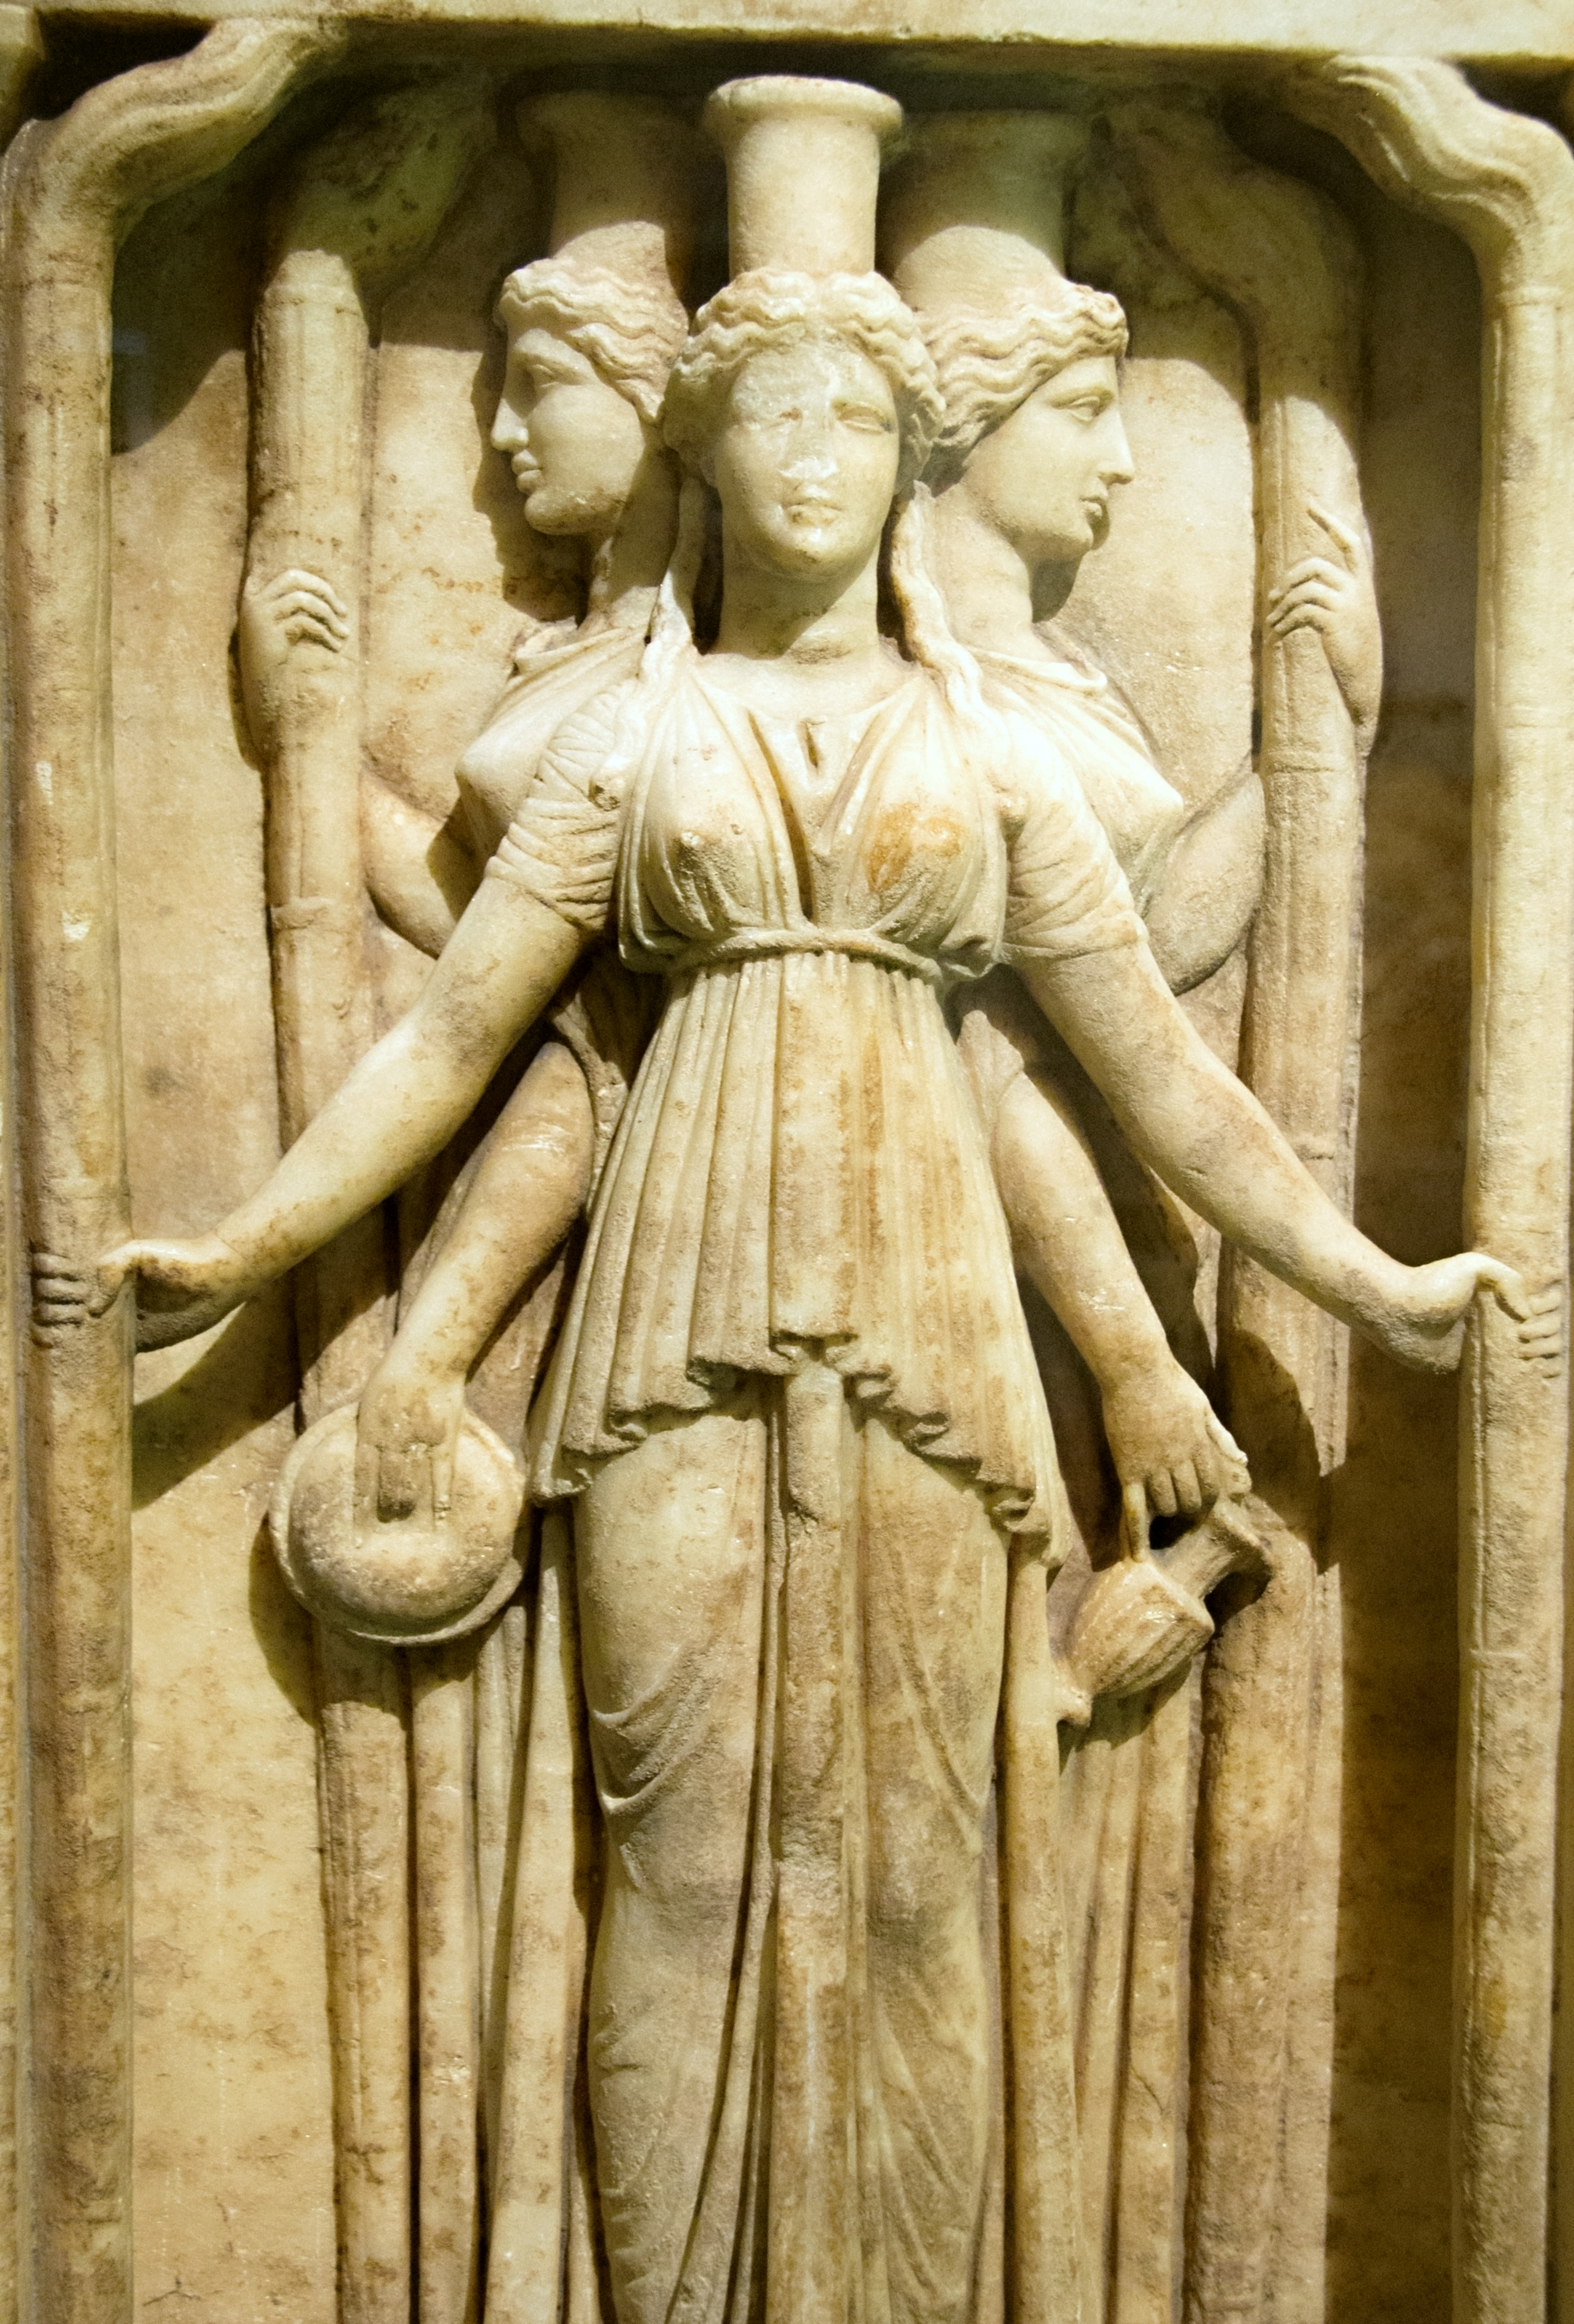 https://upload.wikimedia.org/wikipedia/commons/5/51/Relief_triplicate_Hekate_marble,_Hadrian_clasicism,_Prague_Kinsky,_NM-H10_4742,_140997.jpg